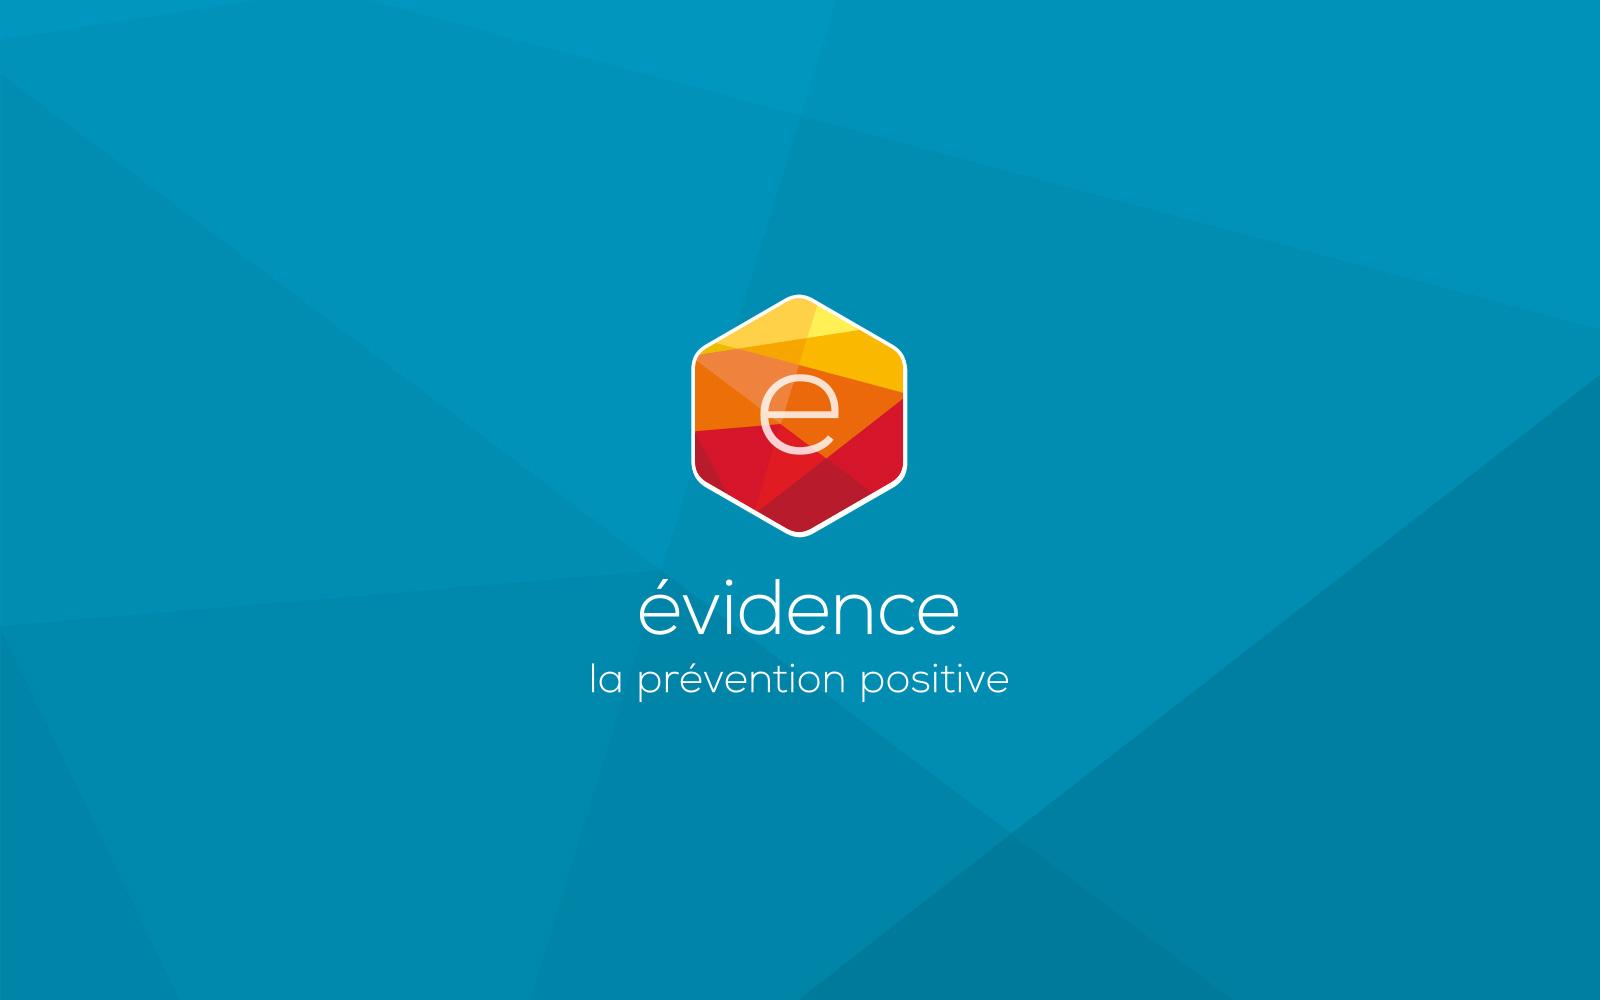 Evidence logo